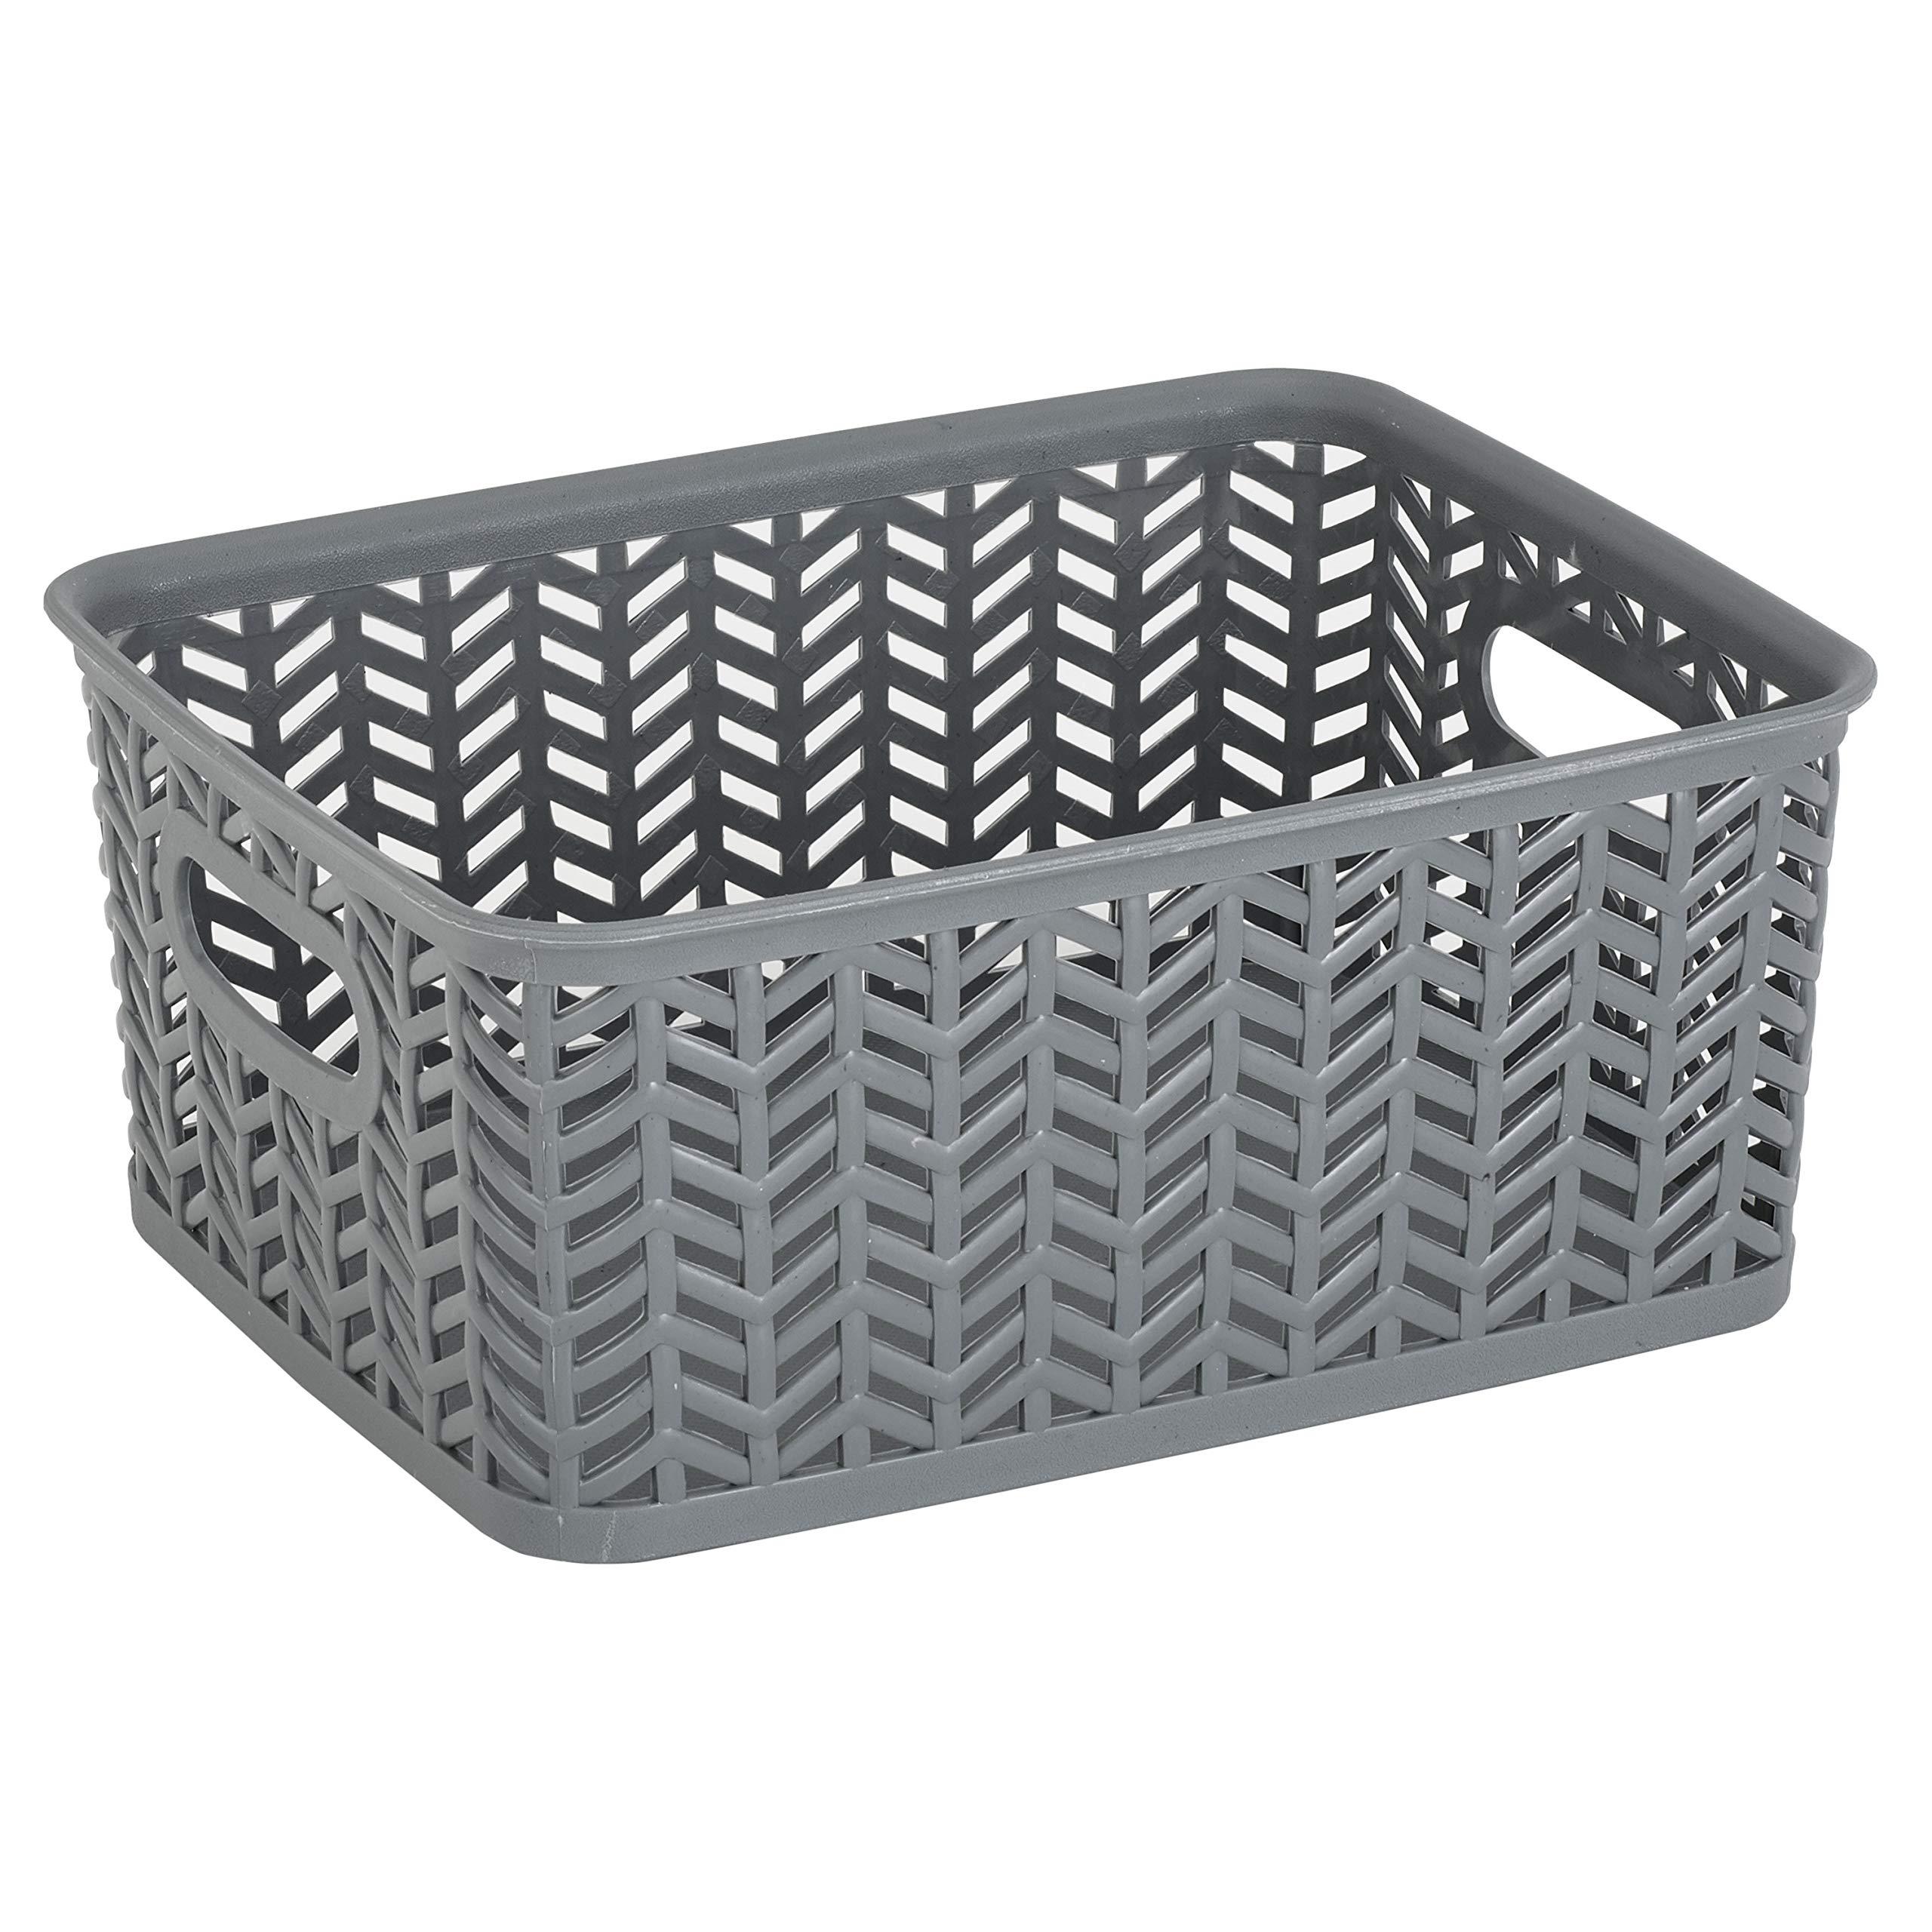 Simplify SmallHerringbone Bin in Grey Storage Basket